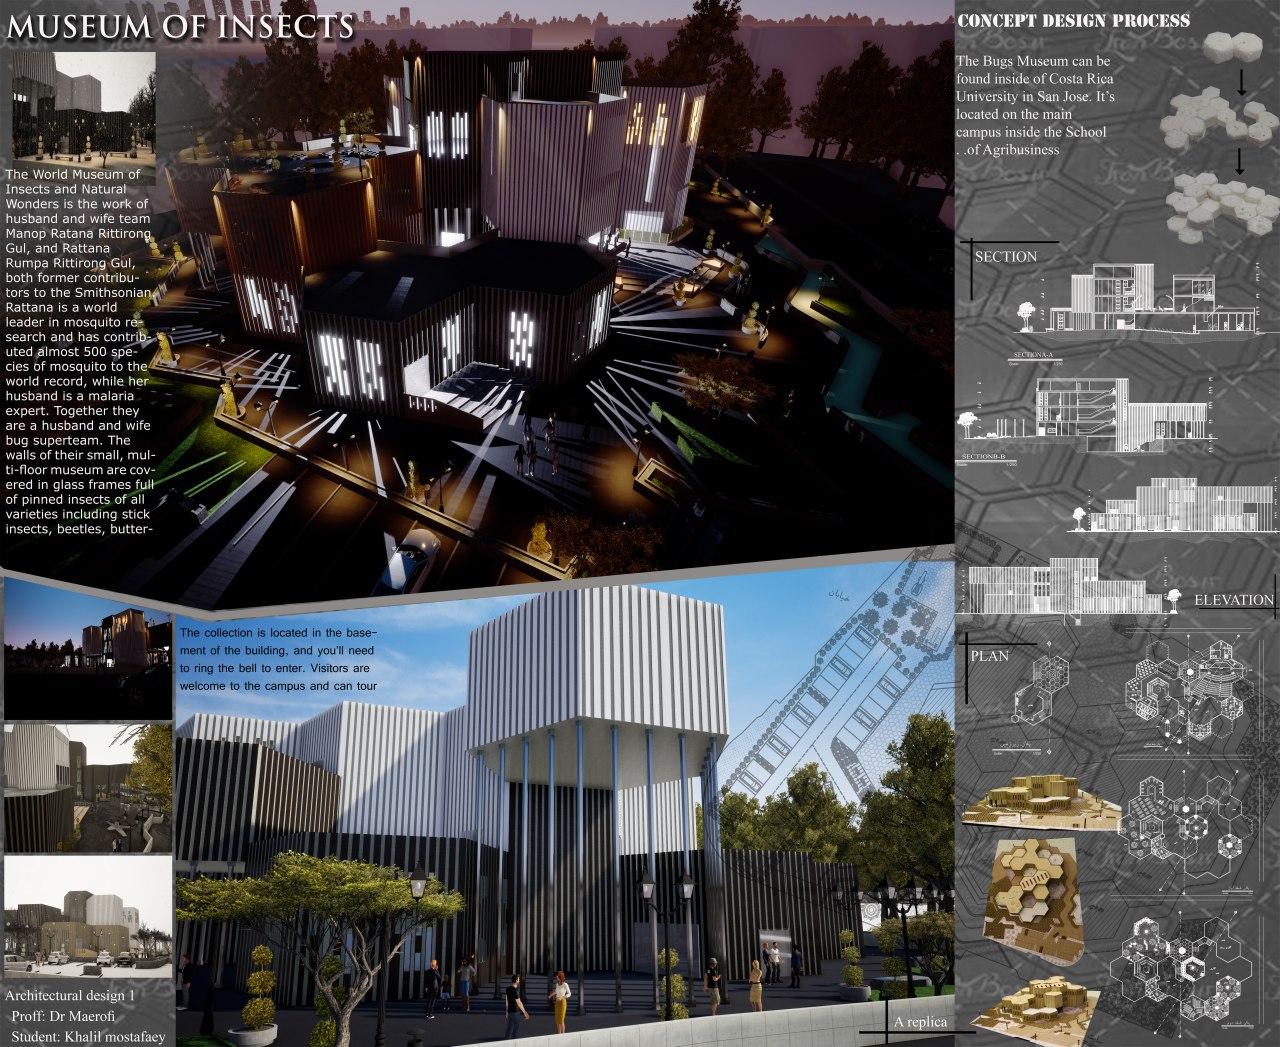 طراحی دکوراسیون داخلی و پلان